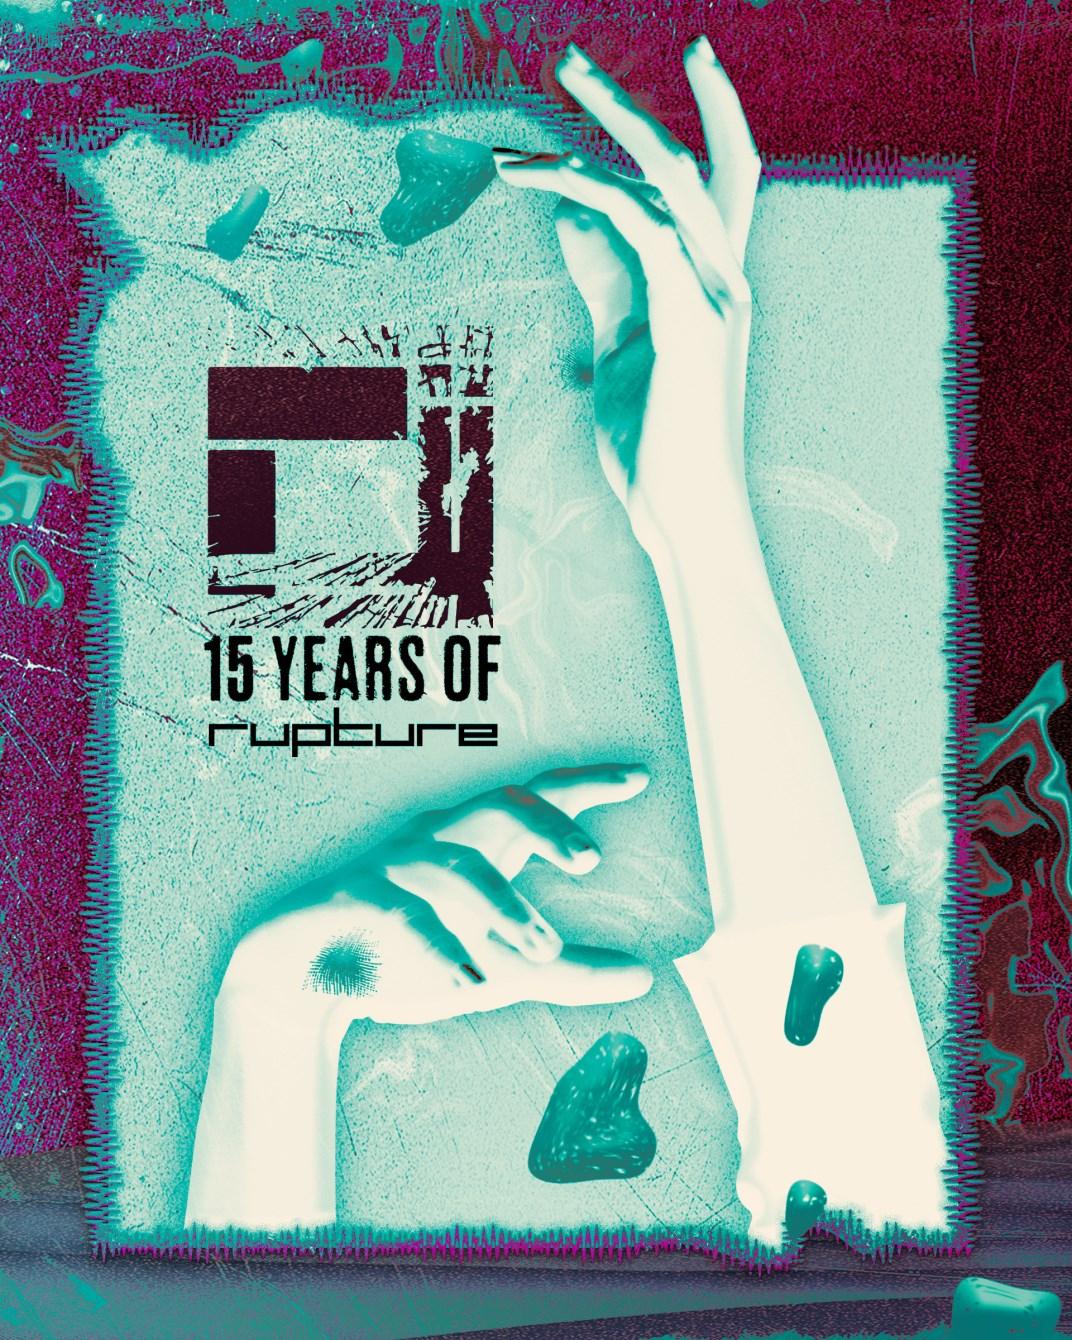 Rupture 15th Birthday (Part 1) - Flyer front